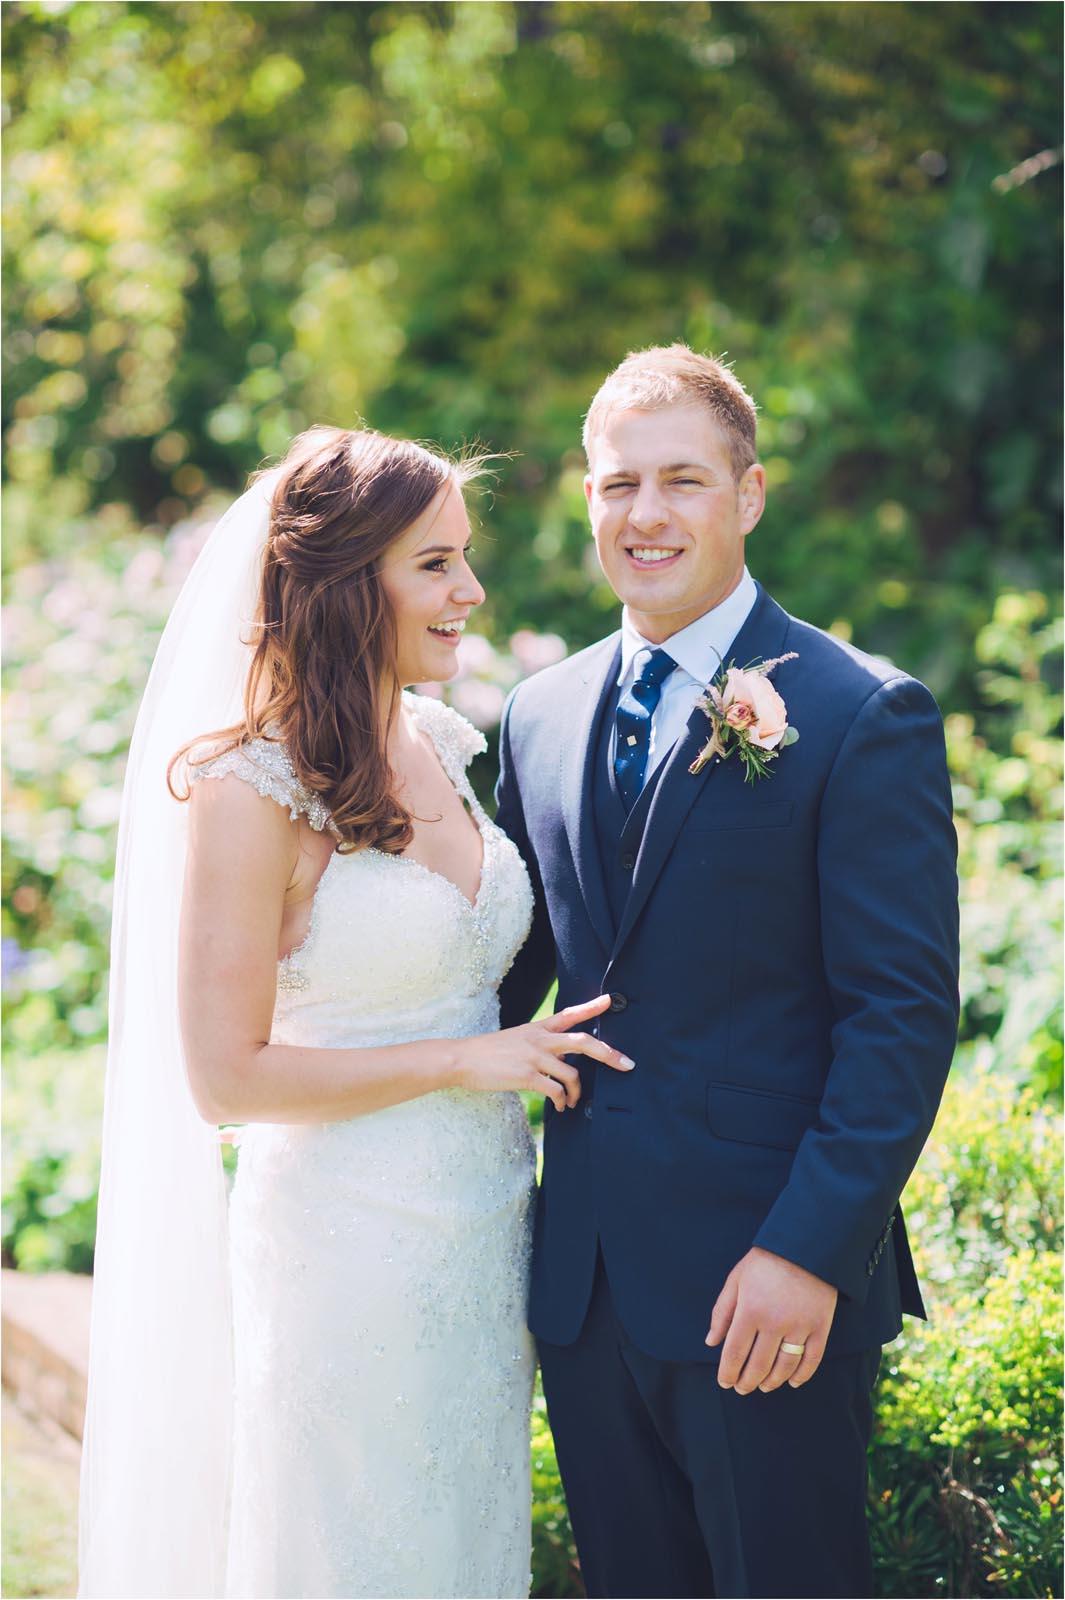 Simon biffen wedding photography 0089